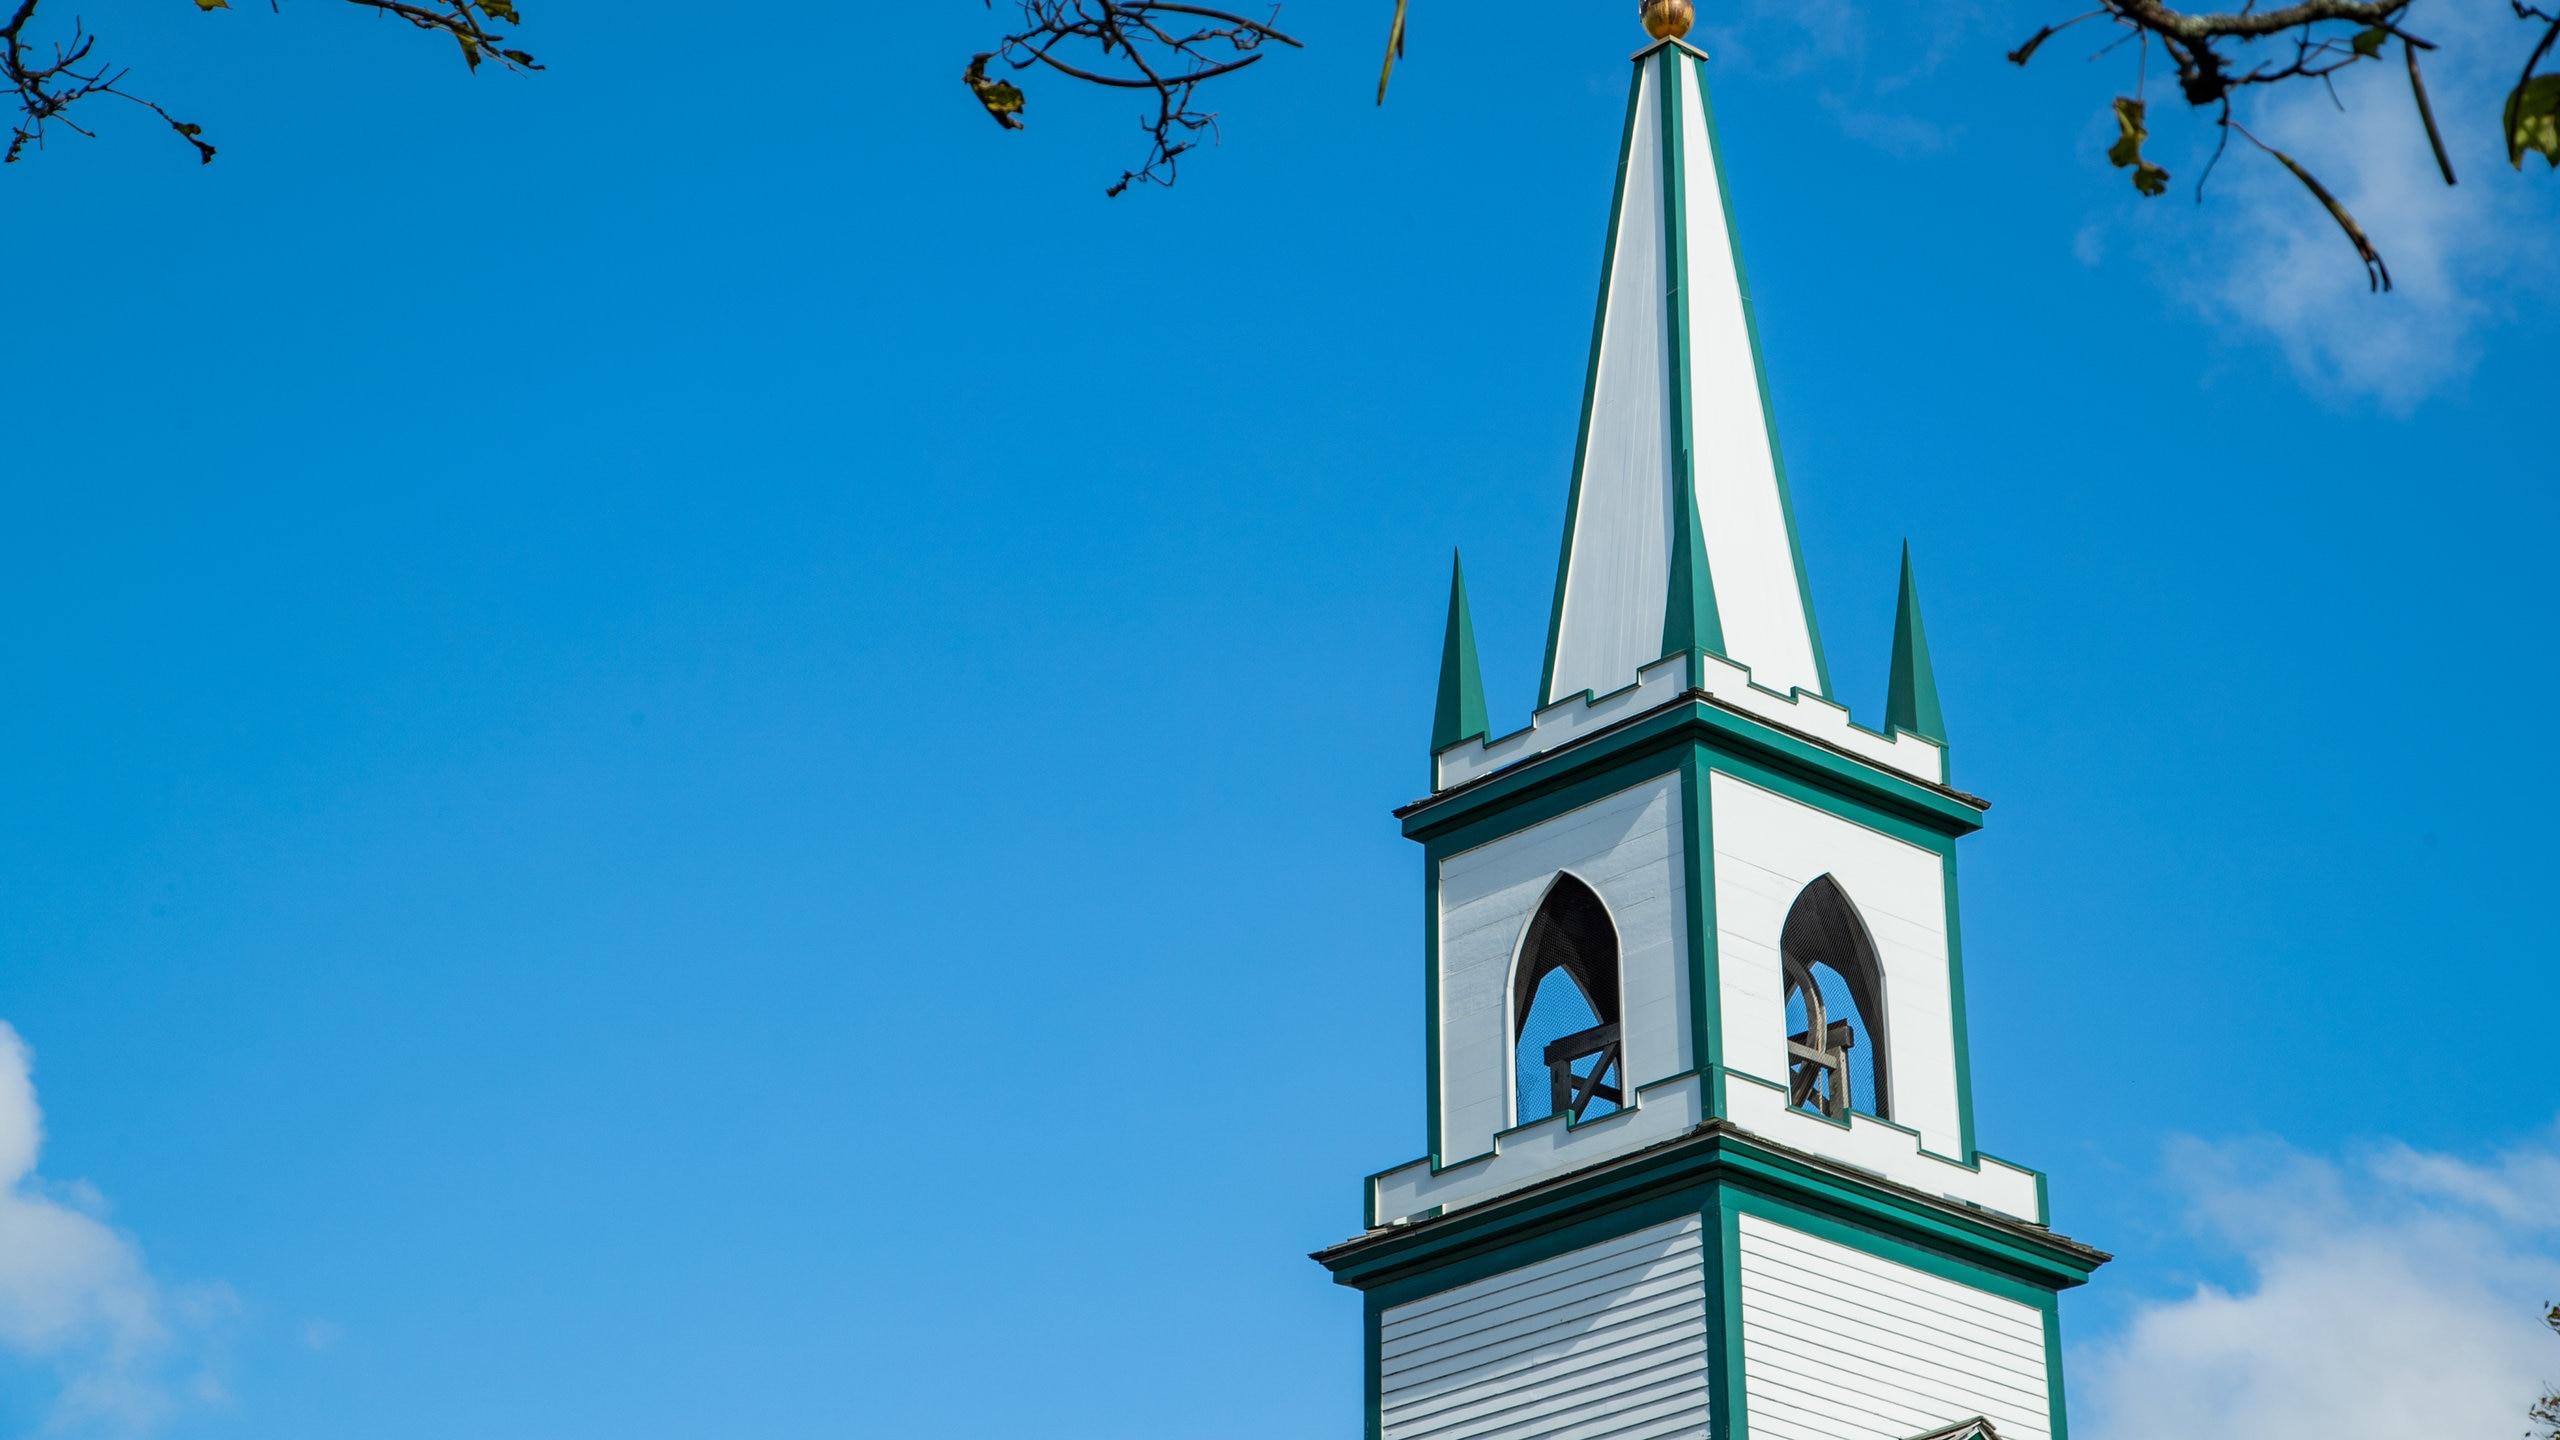 East Falmouth, Massachusetts, United States of America